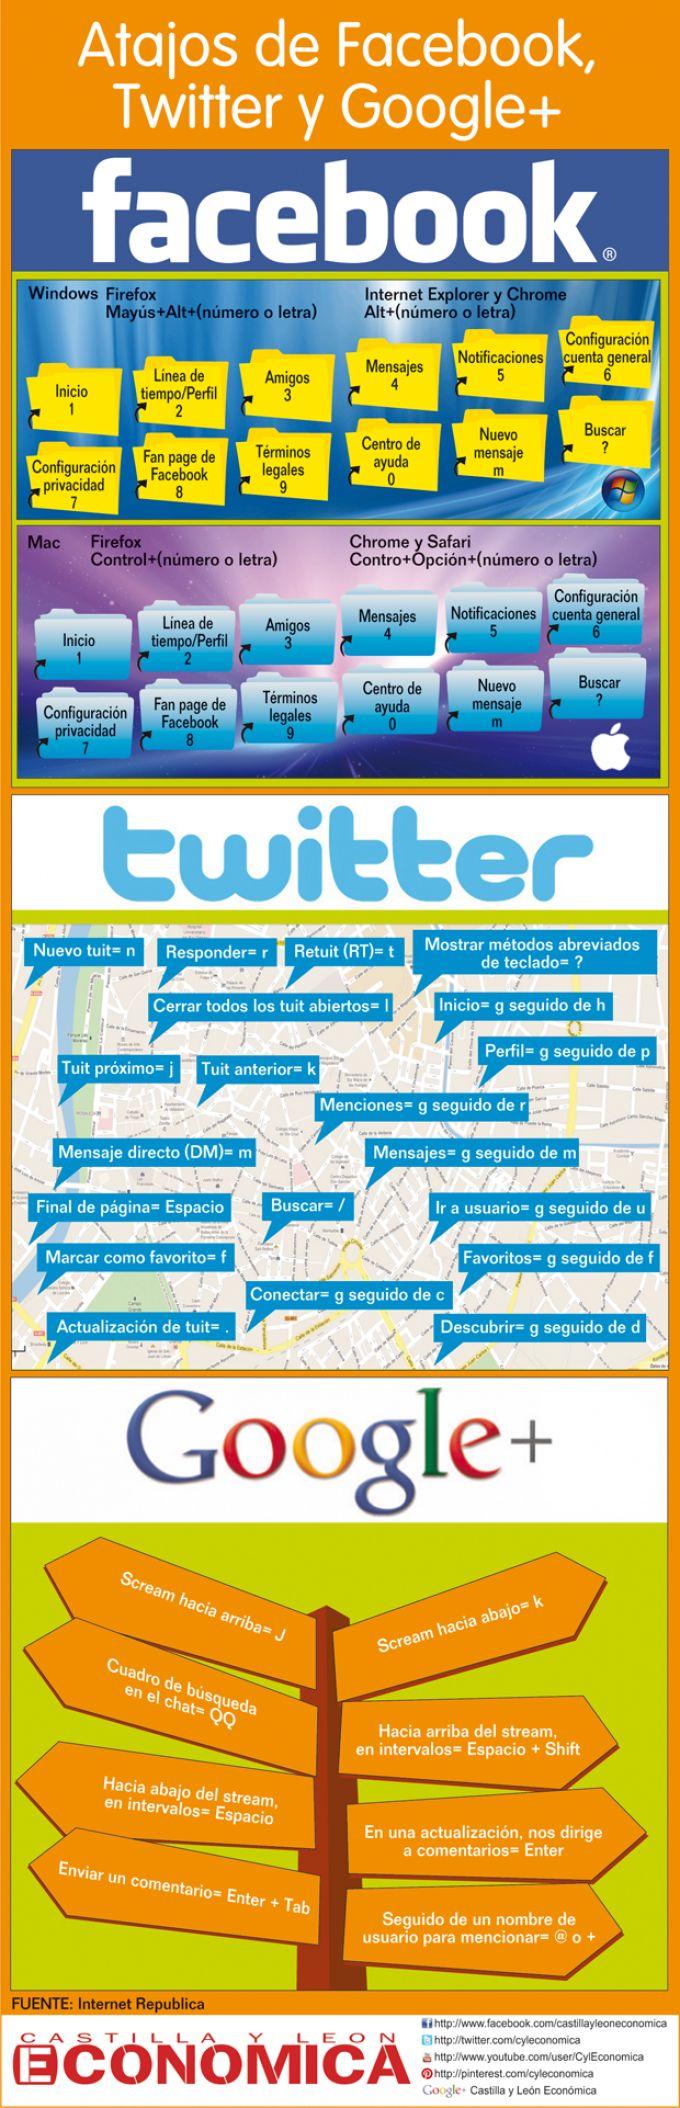 Atajos de FaceBook, Twitter y Google + #infografia #infographic #socialmedia